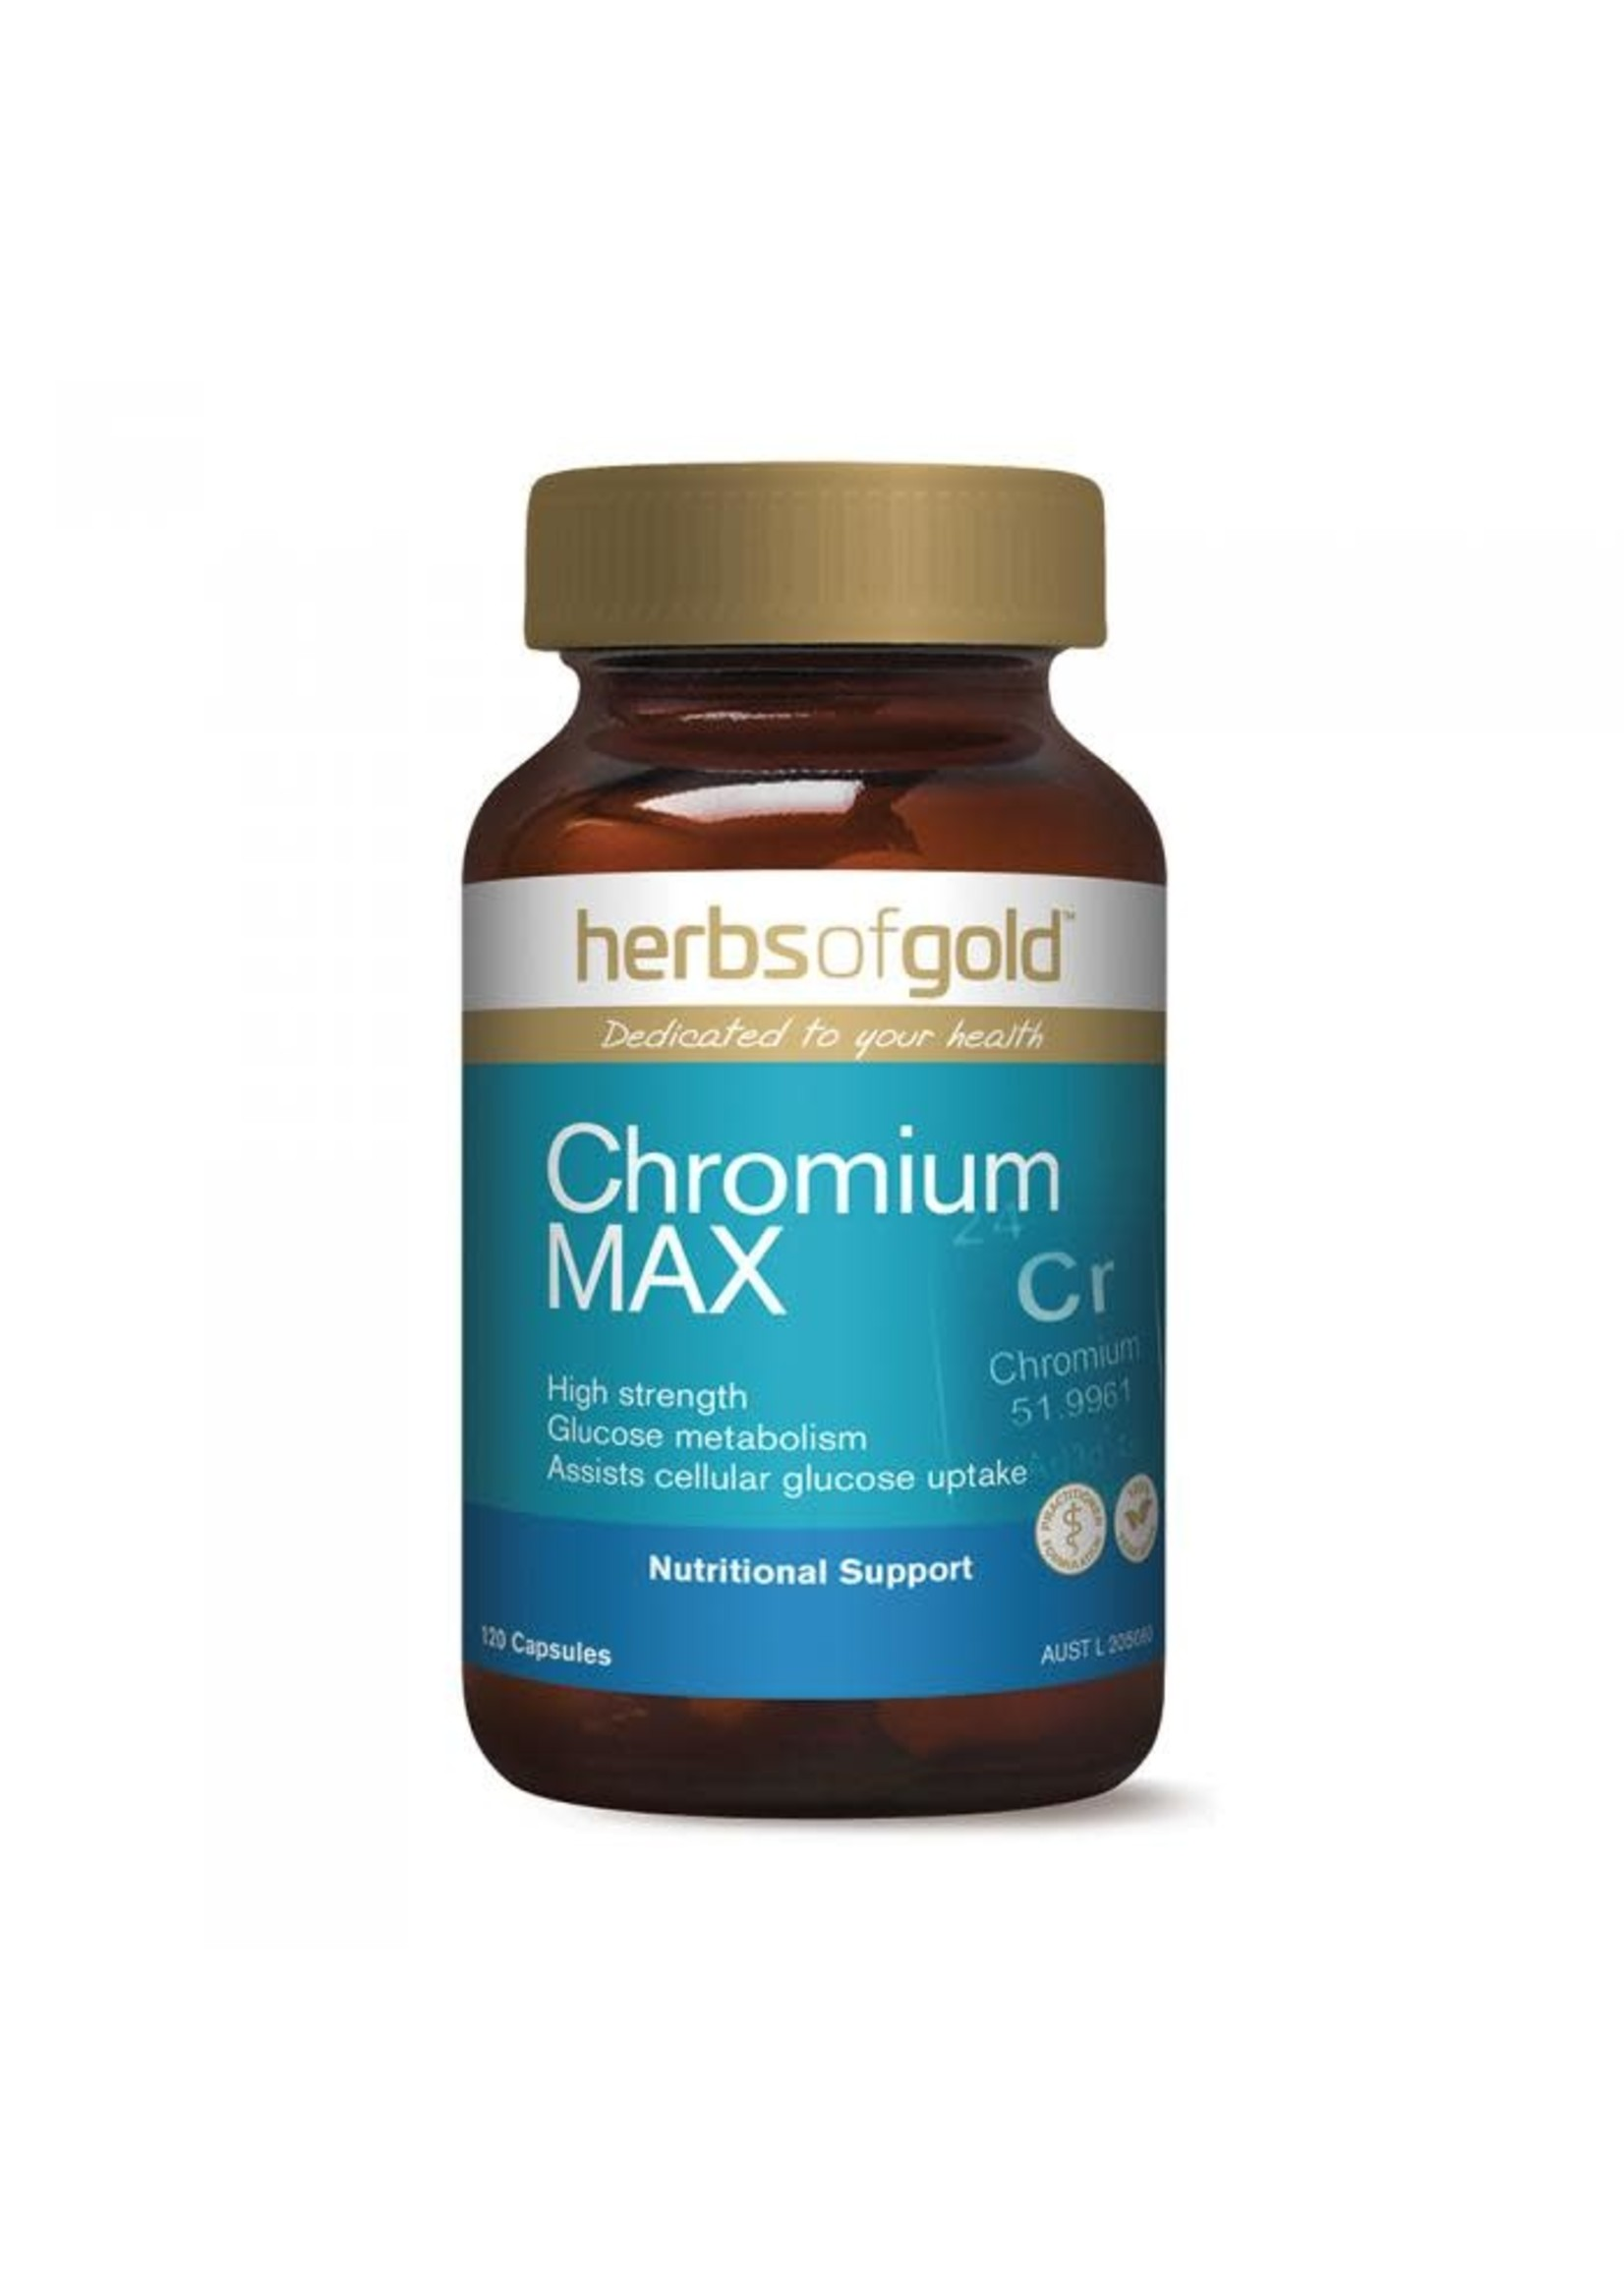 Herbs of Gold Herbs of Gold Chromium Max 120 vege caps